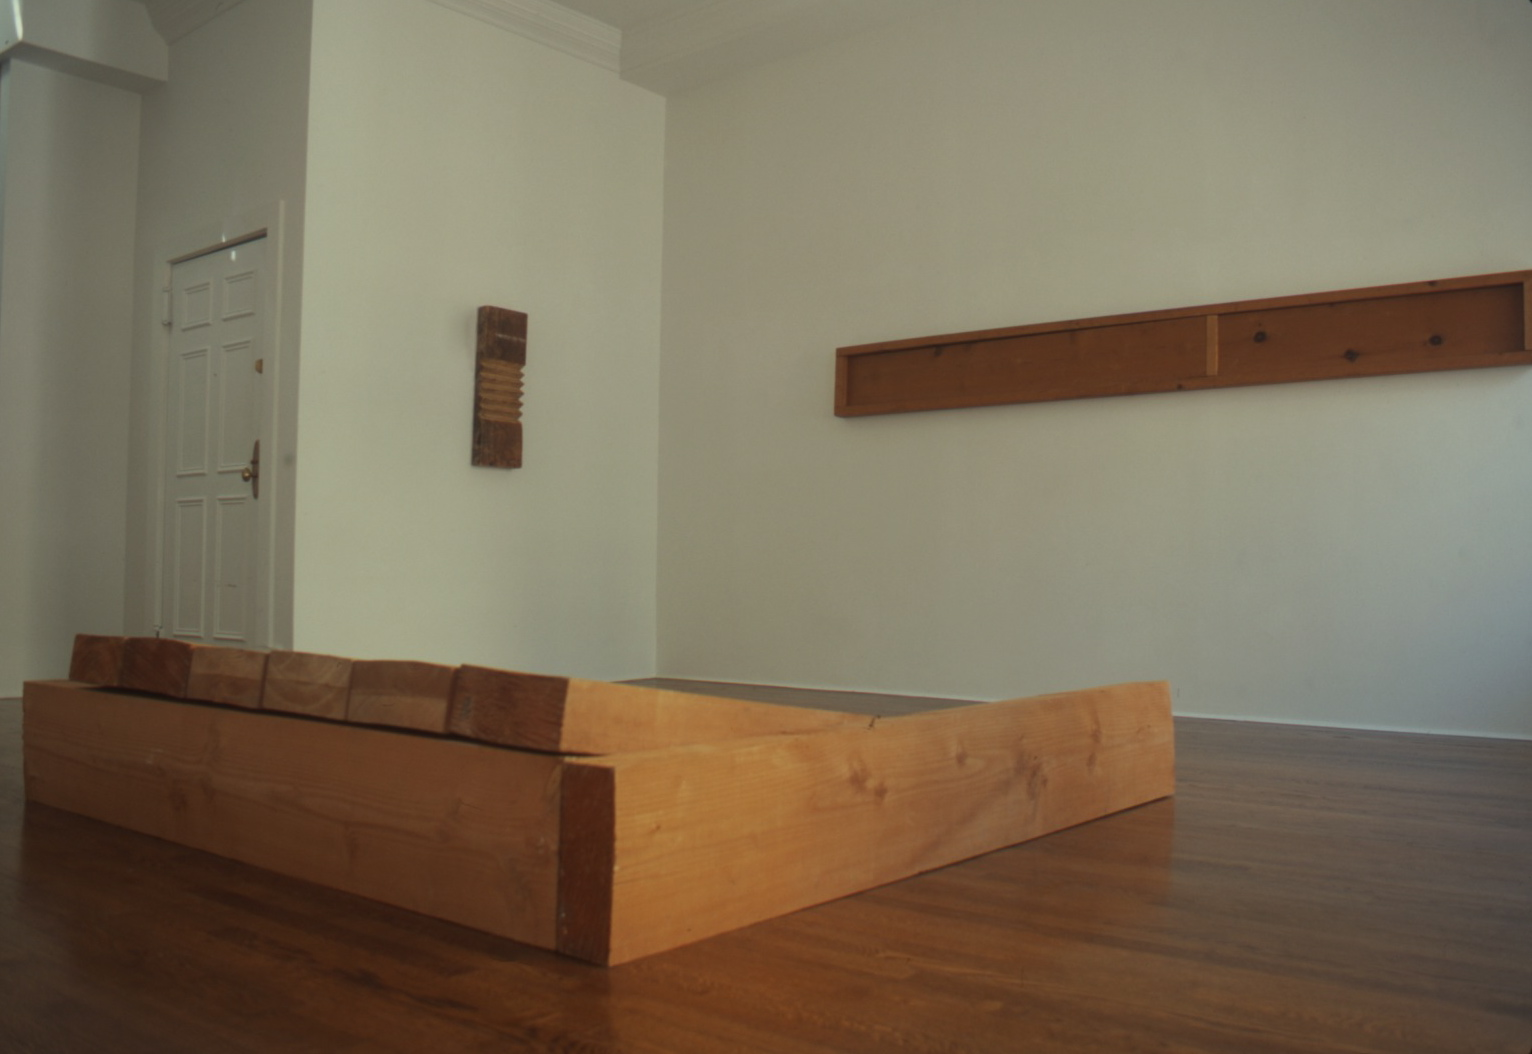 Richard Nonas at Lawrence Markey 2001 11.jpeg